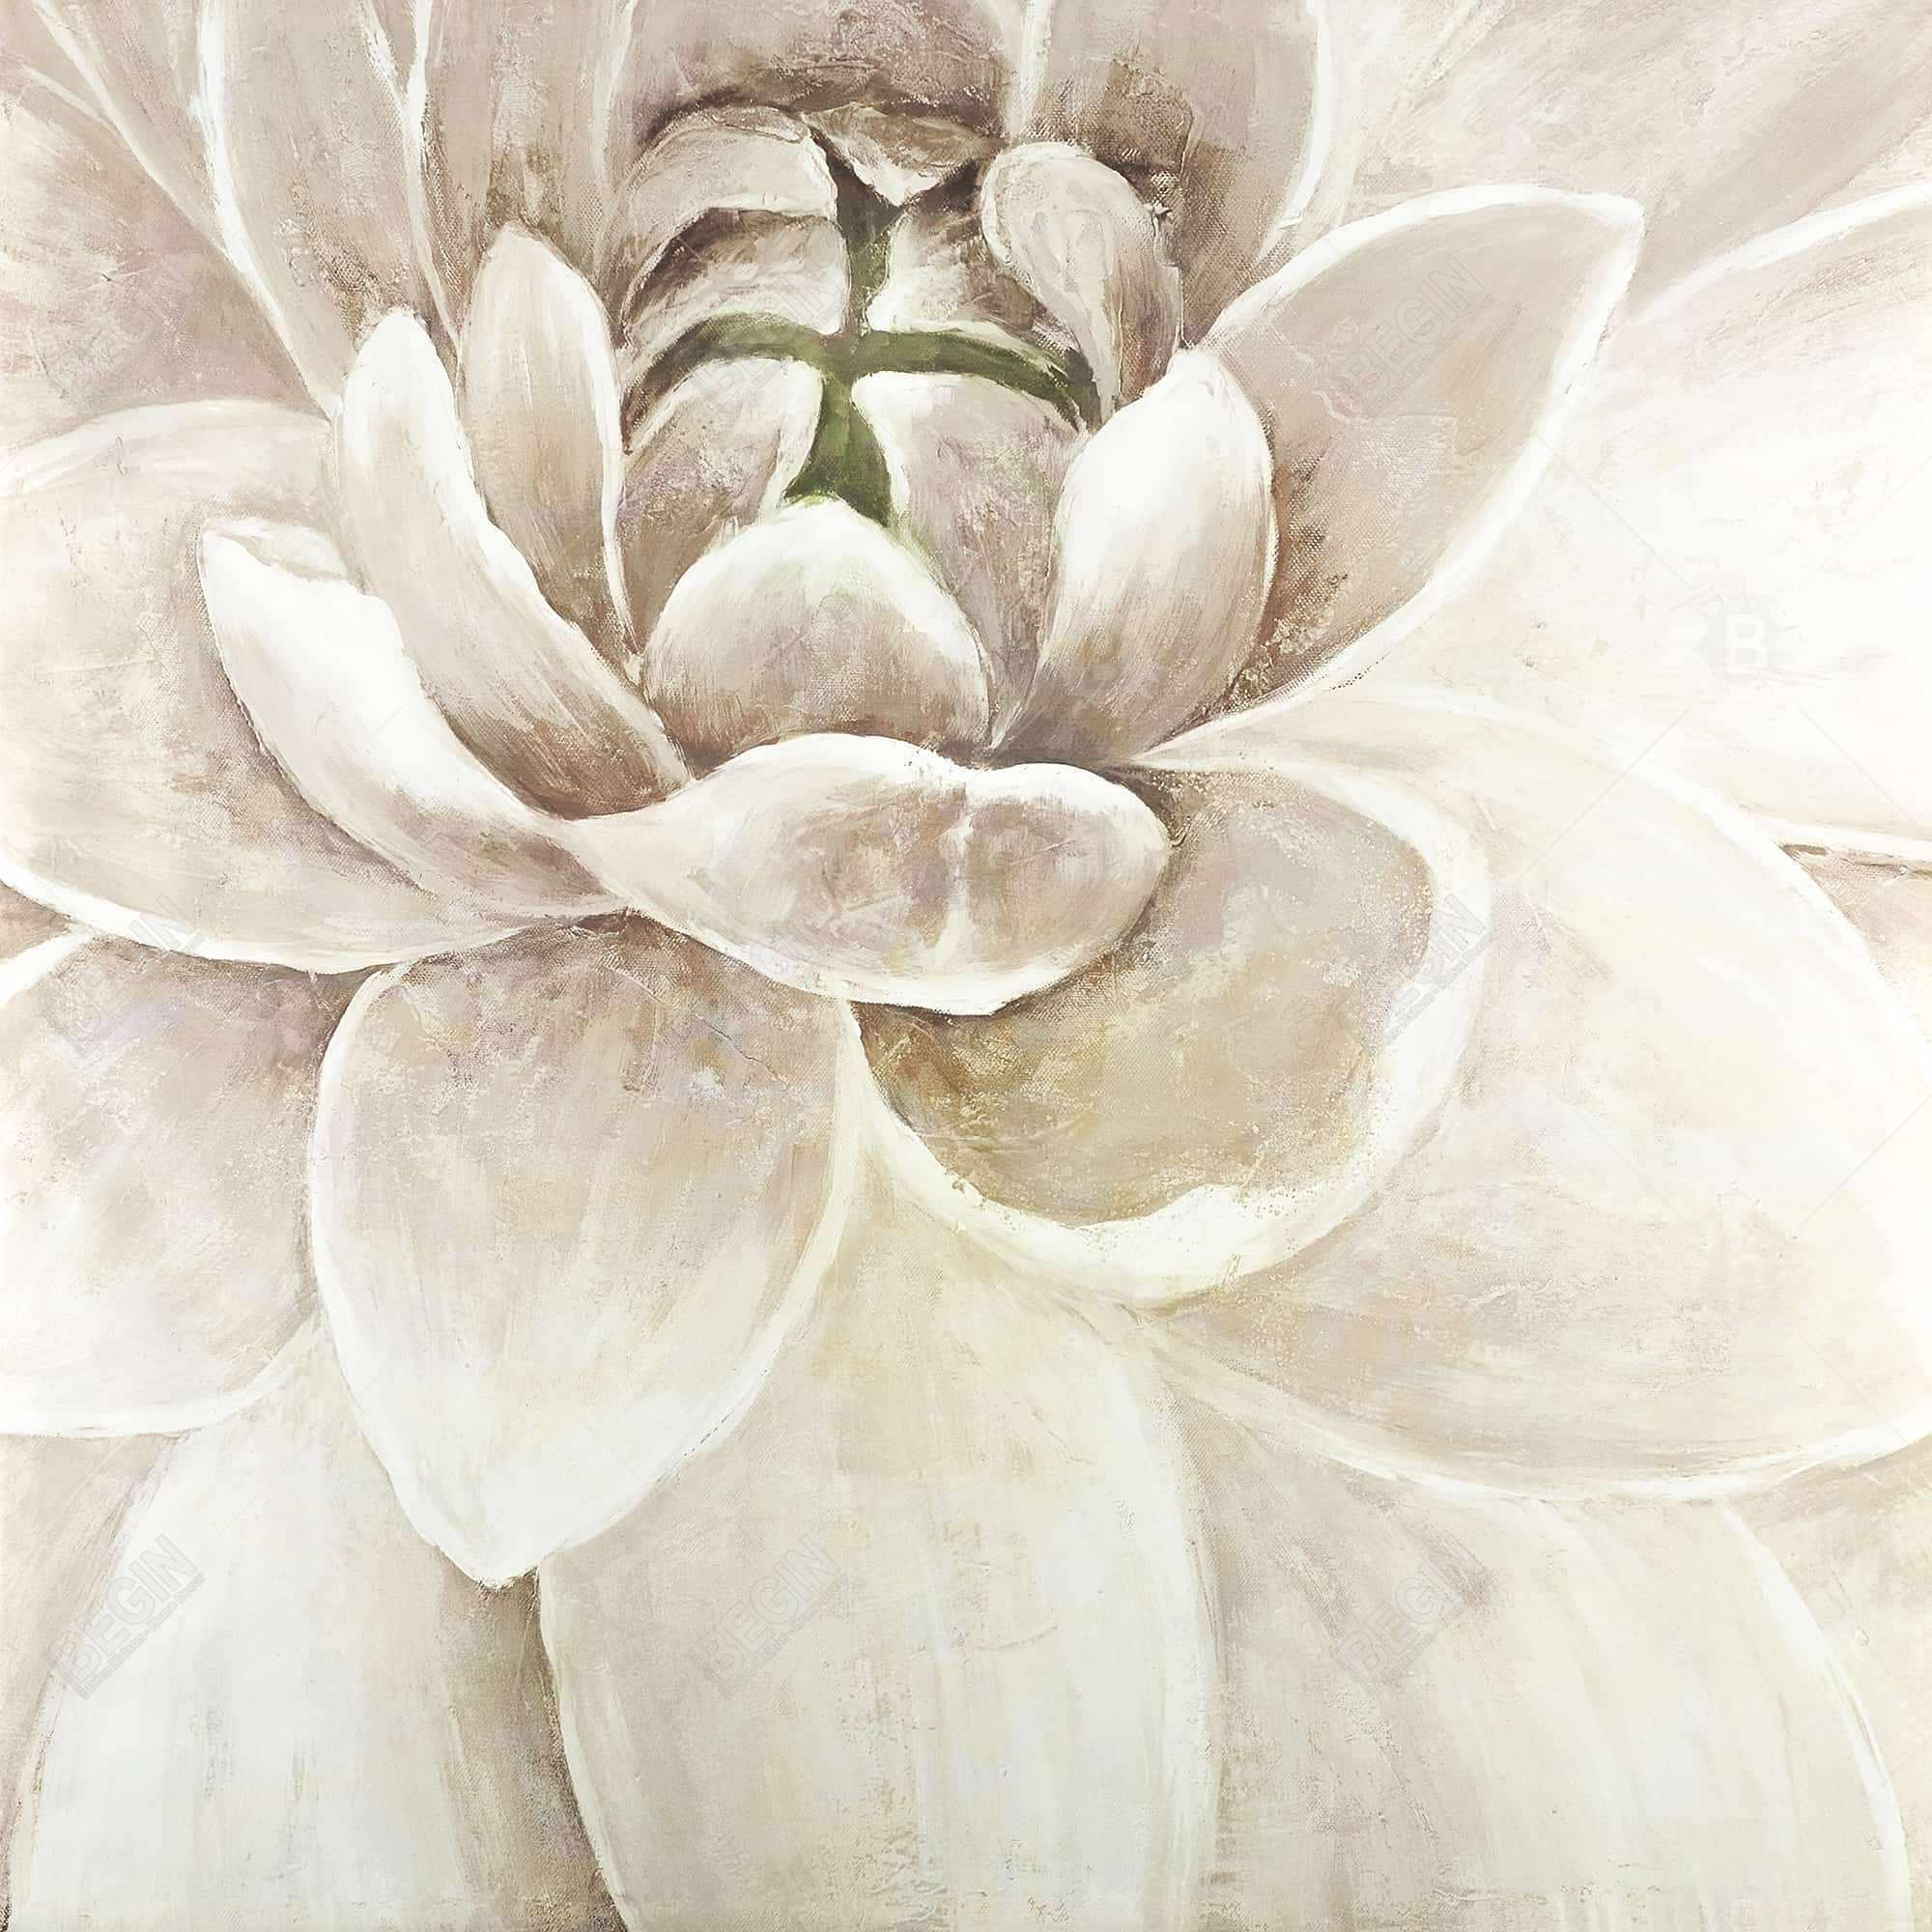 Delicate chrysanthemum